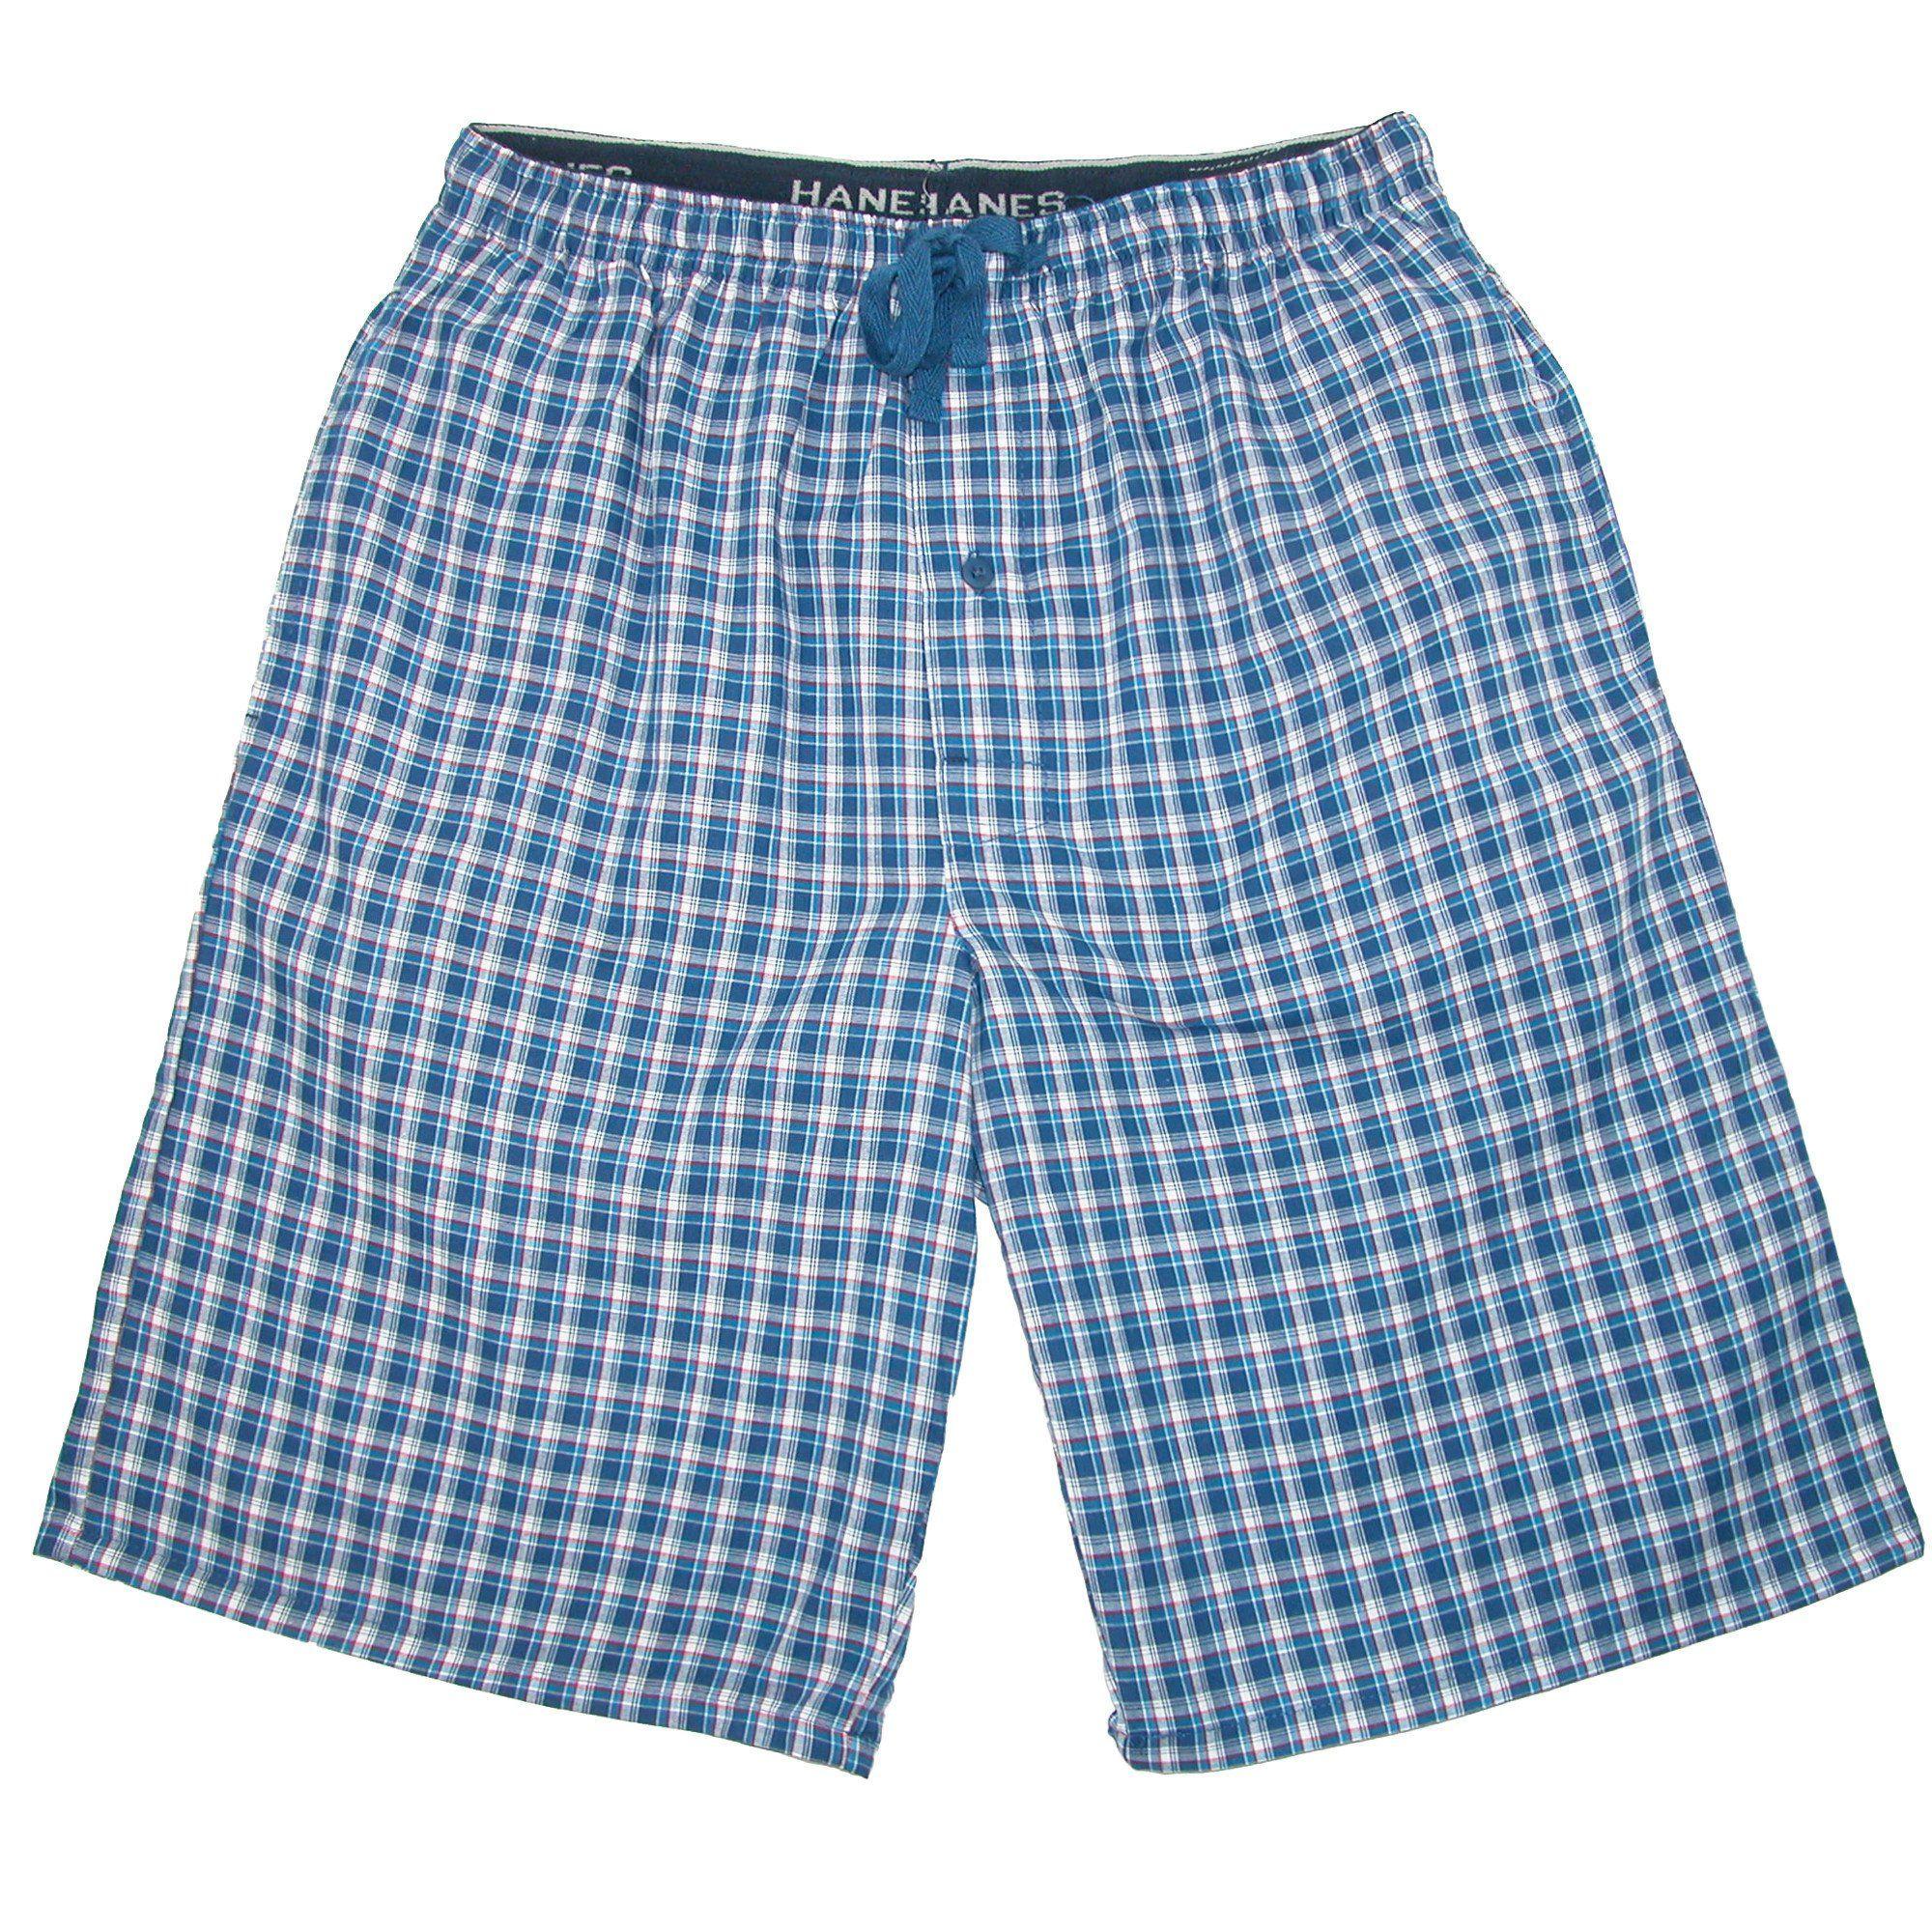 Nautica Mens Sleepwear Woven Plaid Short Pick SZ//Color.